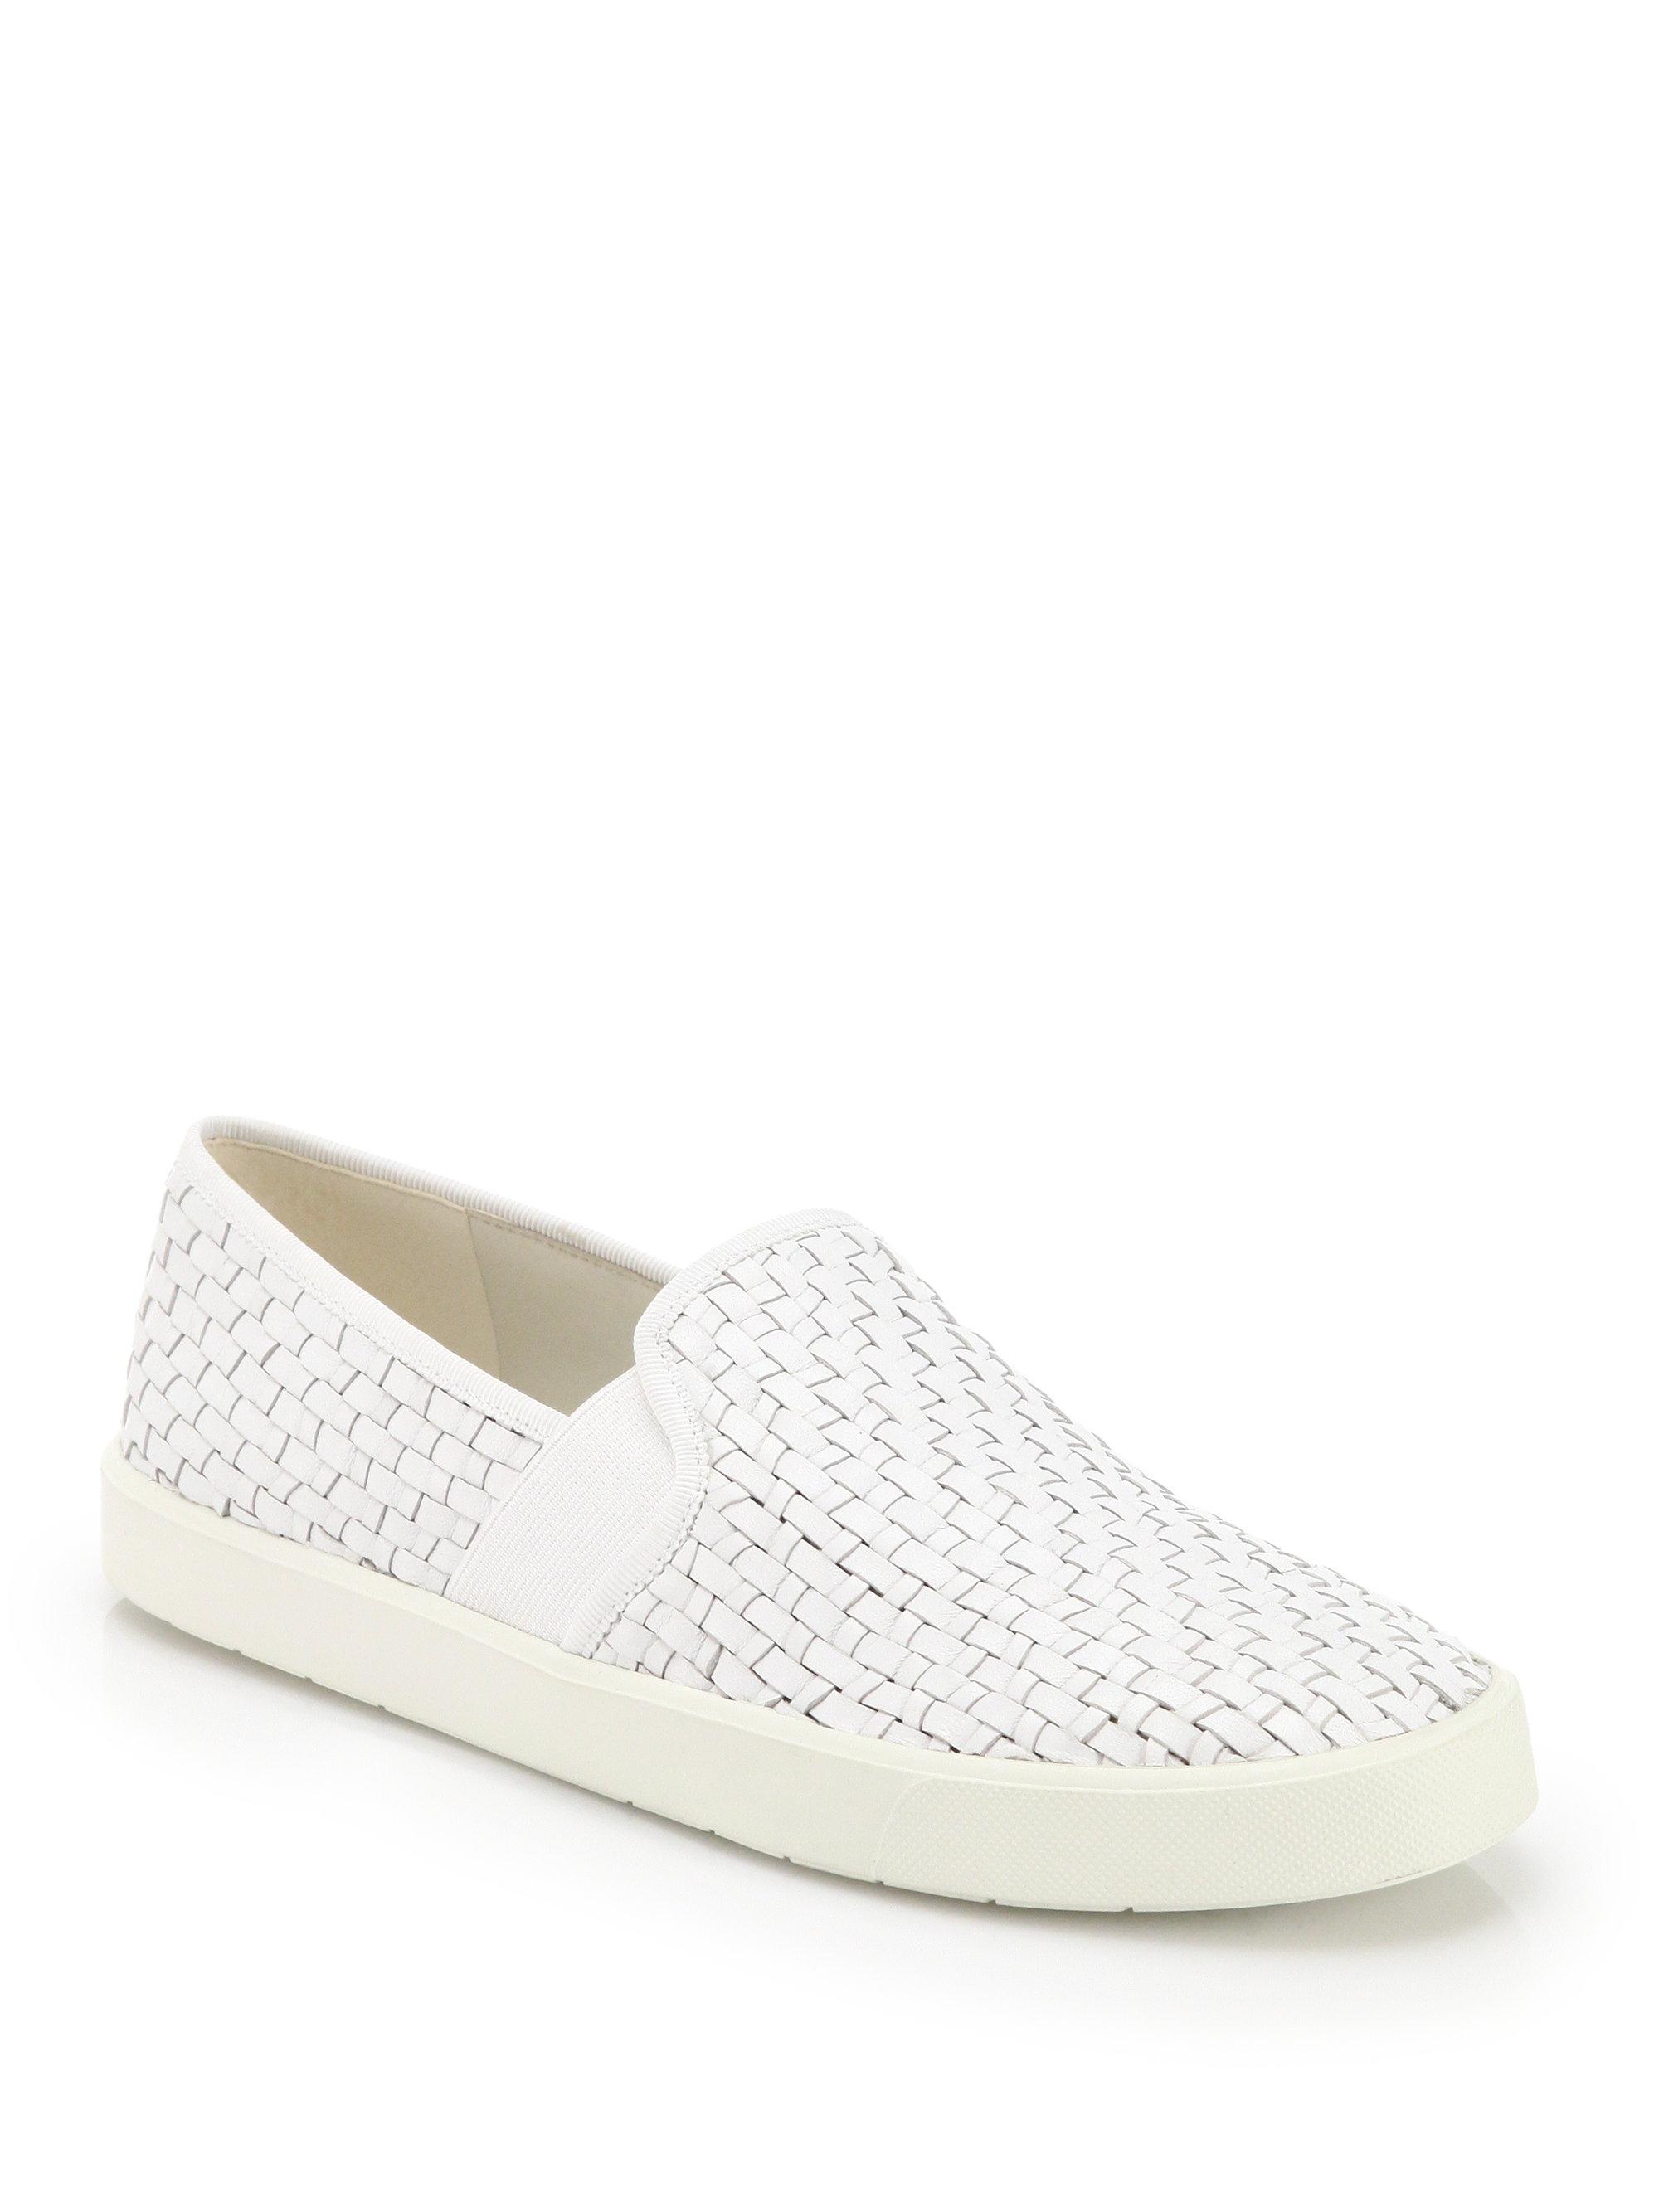 Vince Woven Leather Slip-On Sneakers discount best cheap sale original cheap 2014 unisex Orange 100% Original sale cheap RnTZGa9